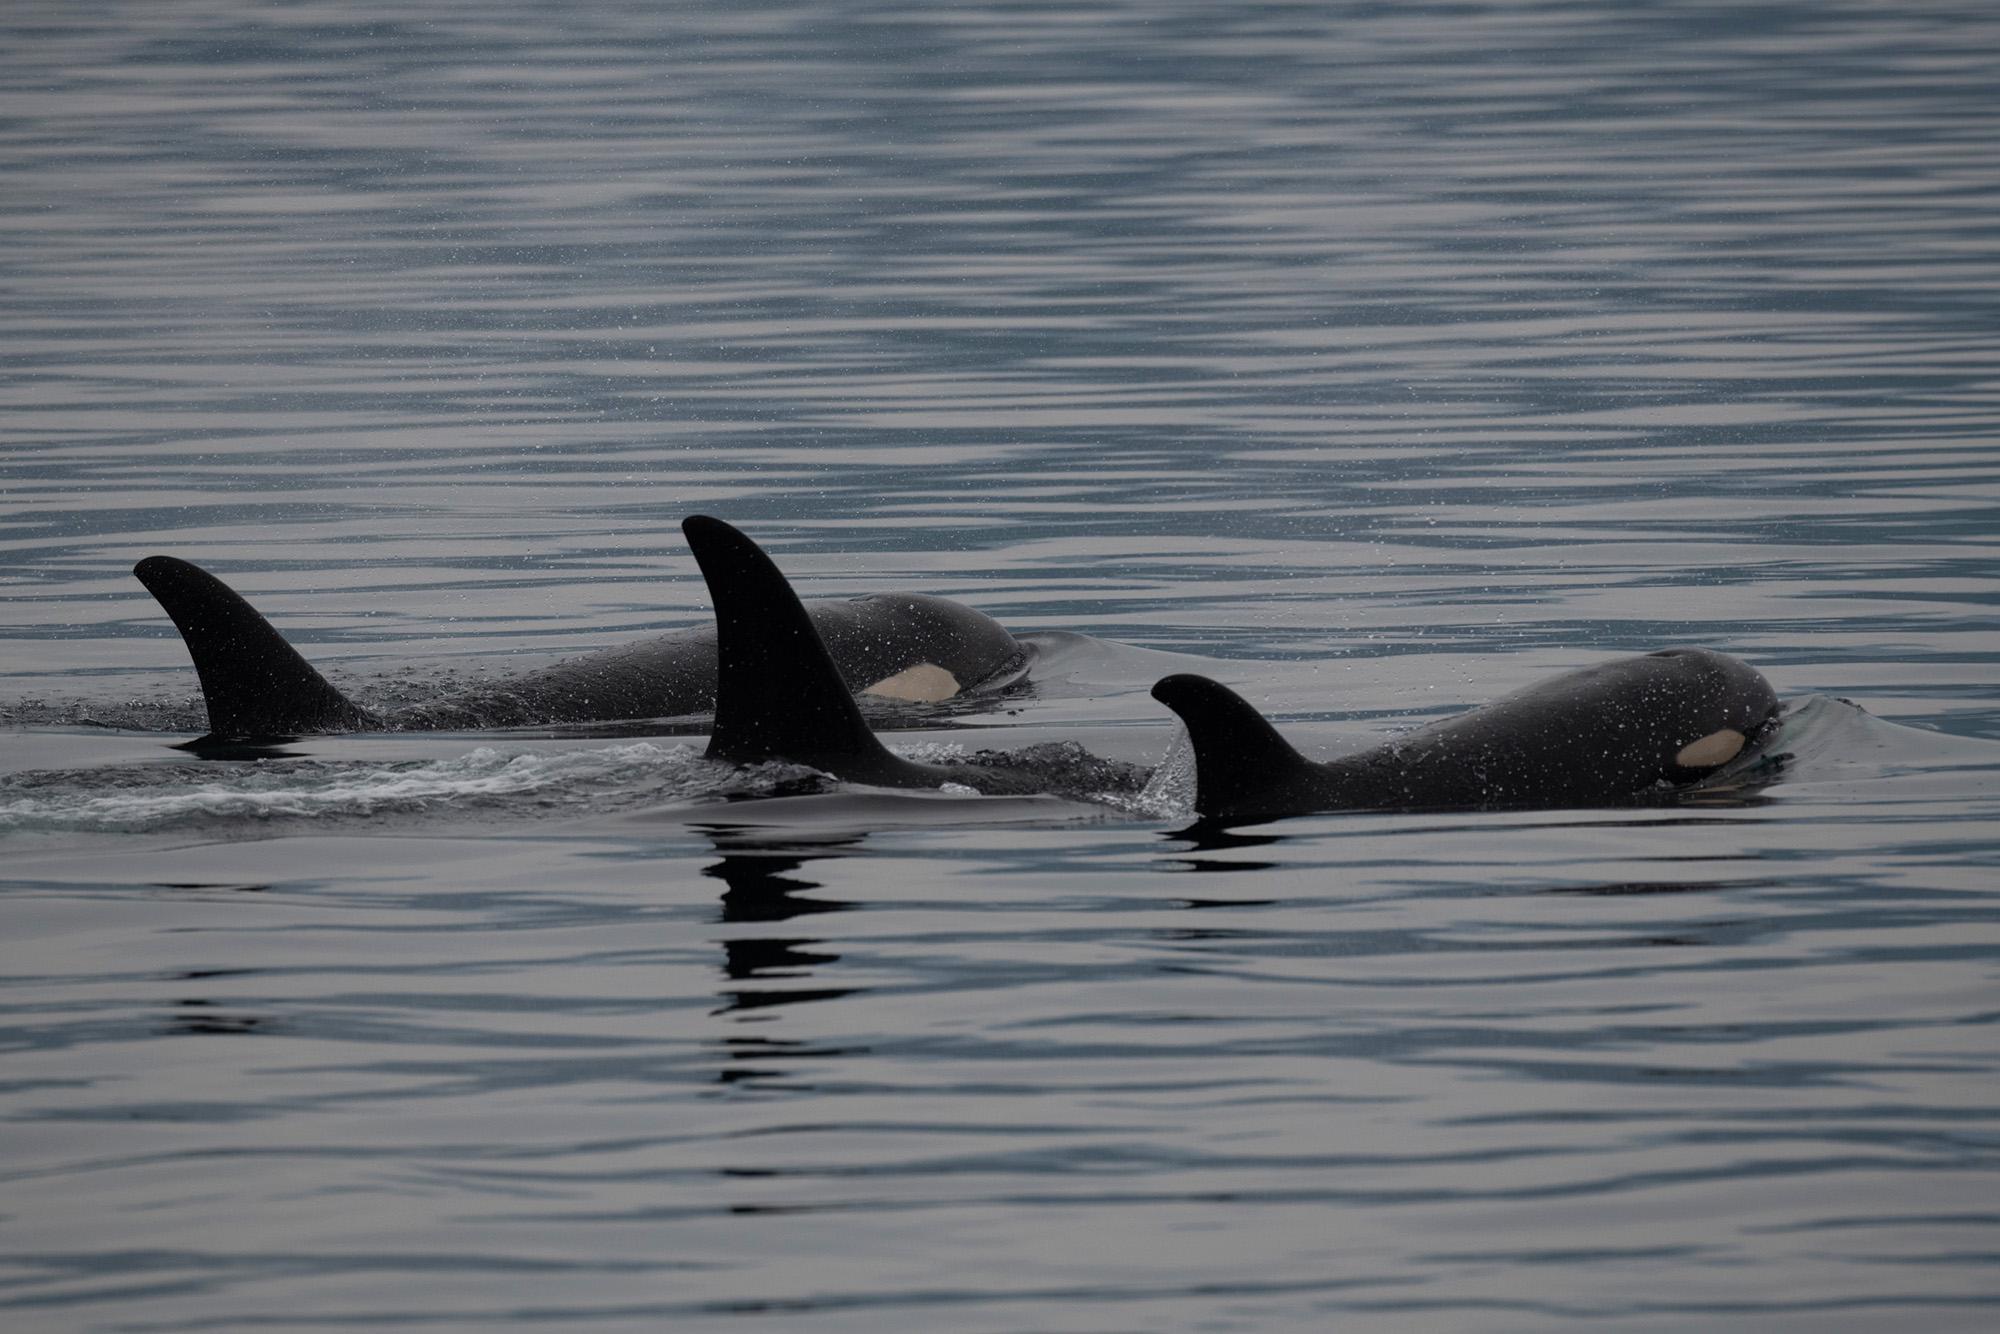 Three Orcas Surfacing